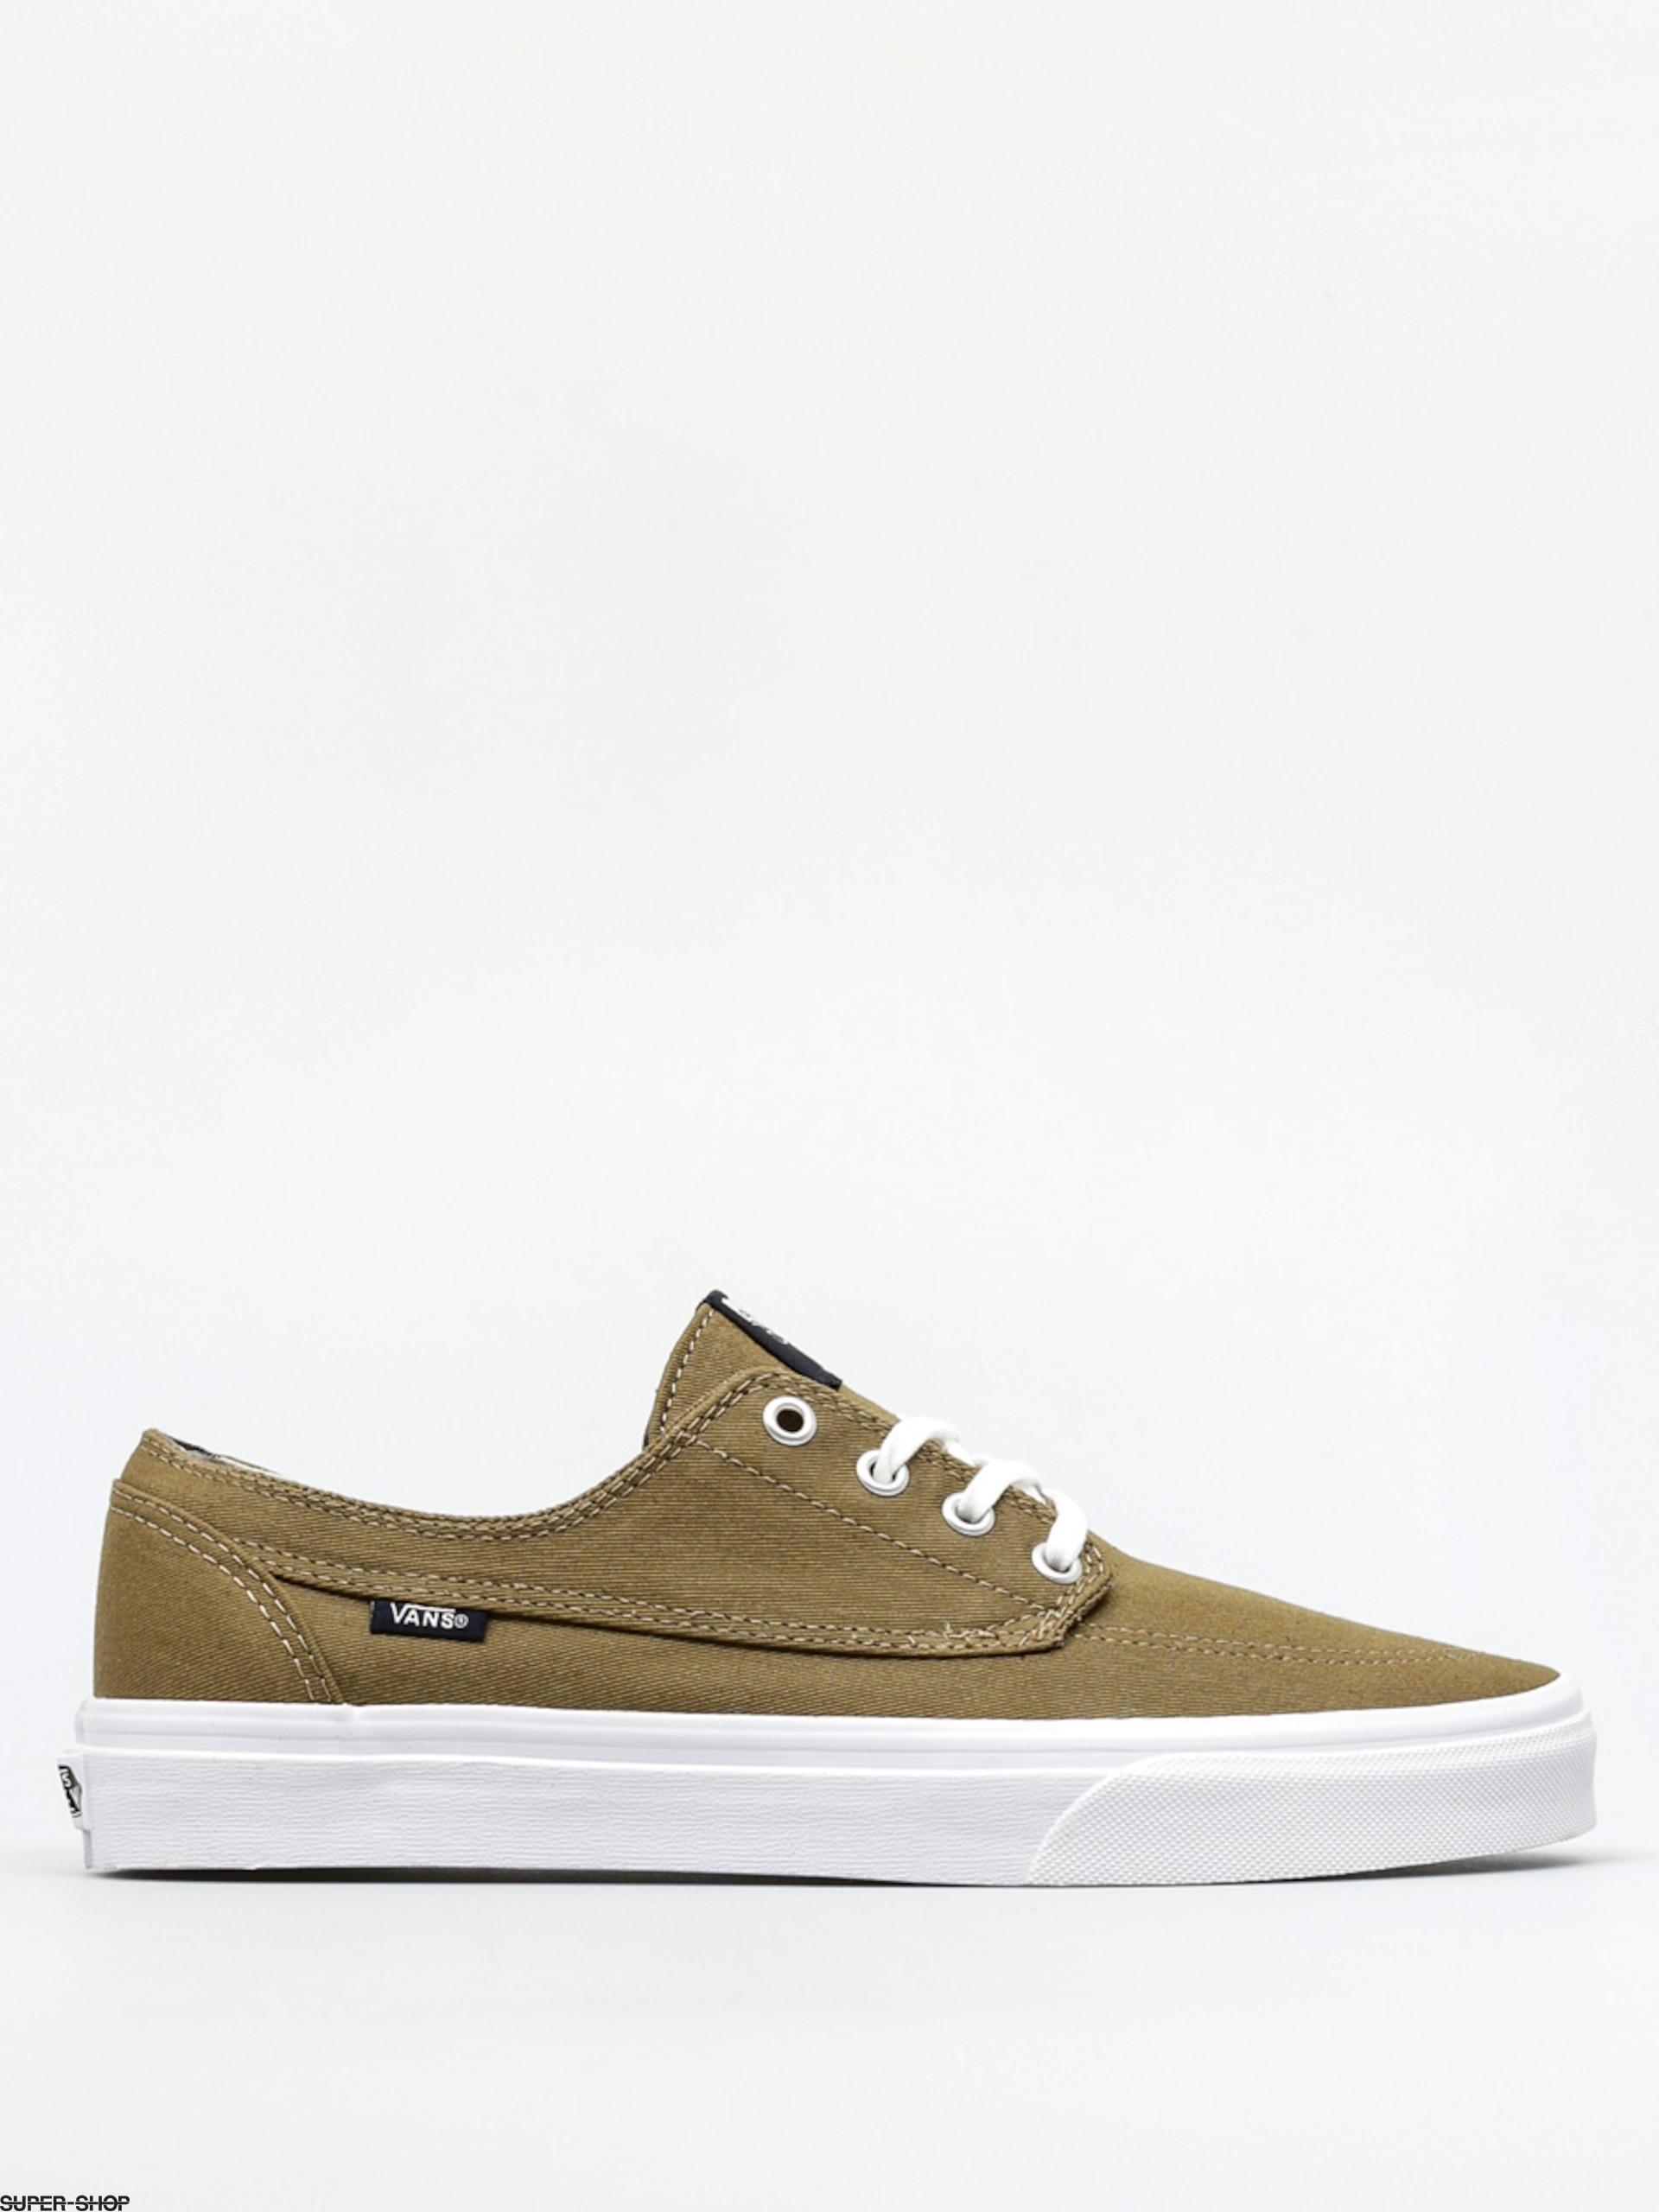 87eacb245a Vans Shoes Brigata (deck club covert green)